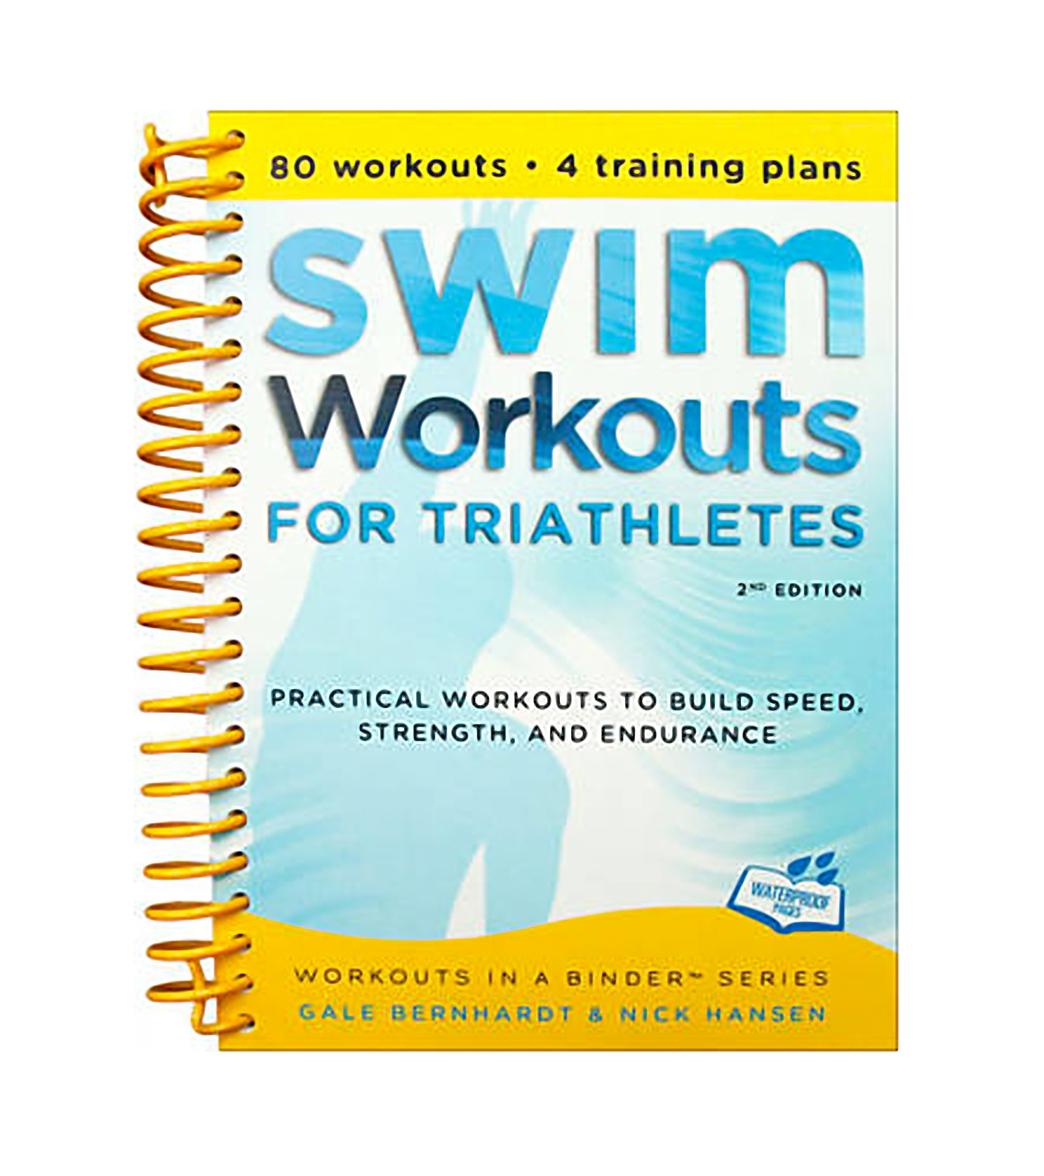 Swim Workouts for Triathletes, 2nd Edition by Gale Bernhardt & Nick Hansen